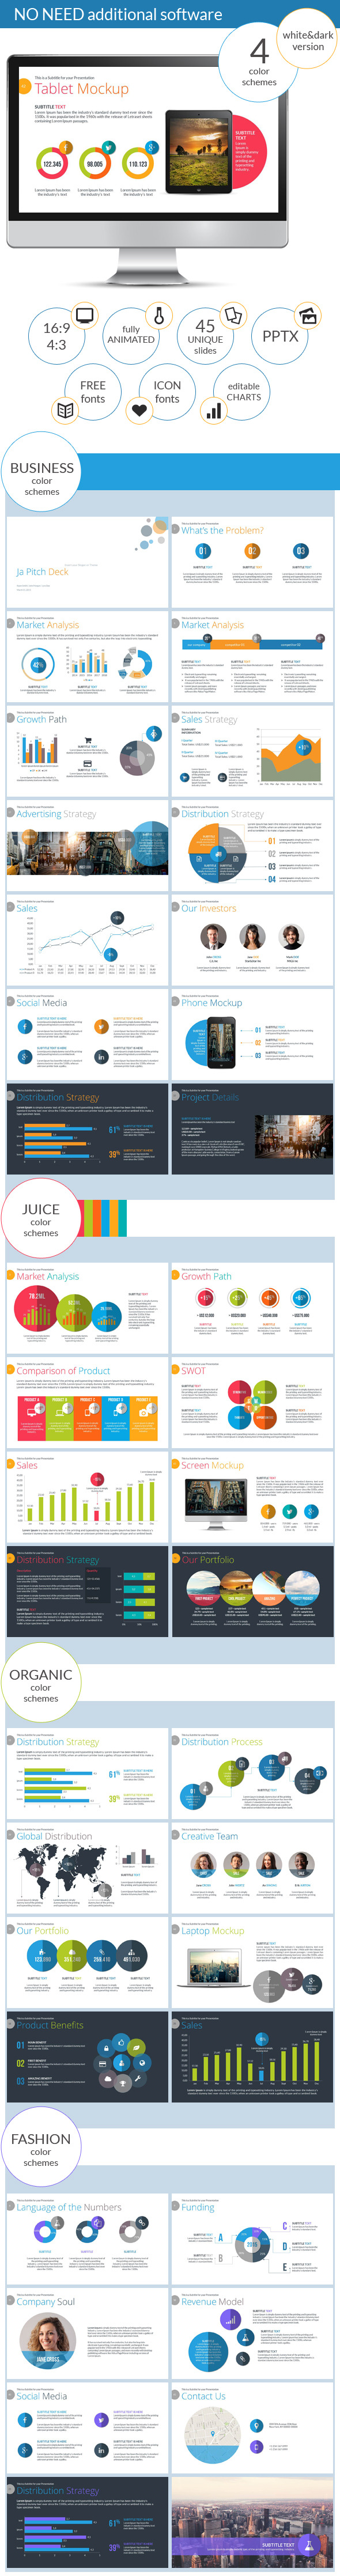 Ja Pitch Deck PowerPoint Presentation  - Pitch Deck PowerPoint Templates